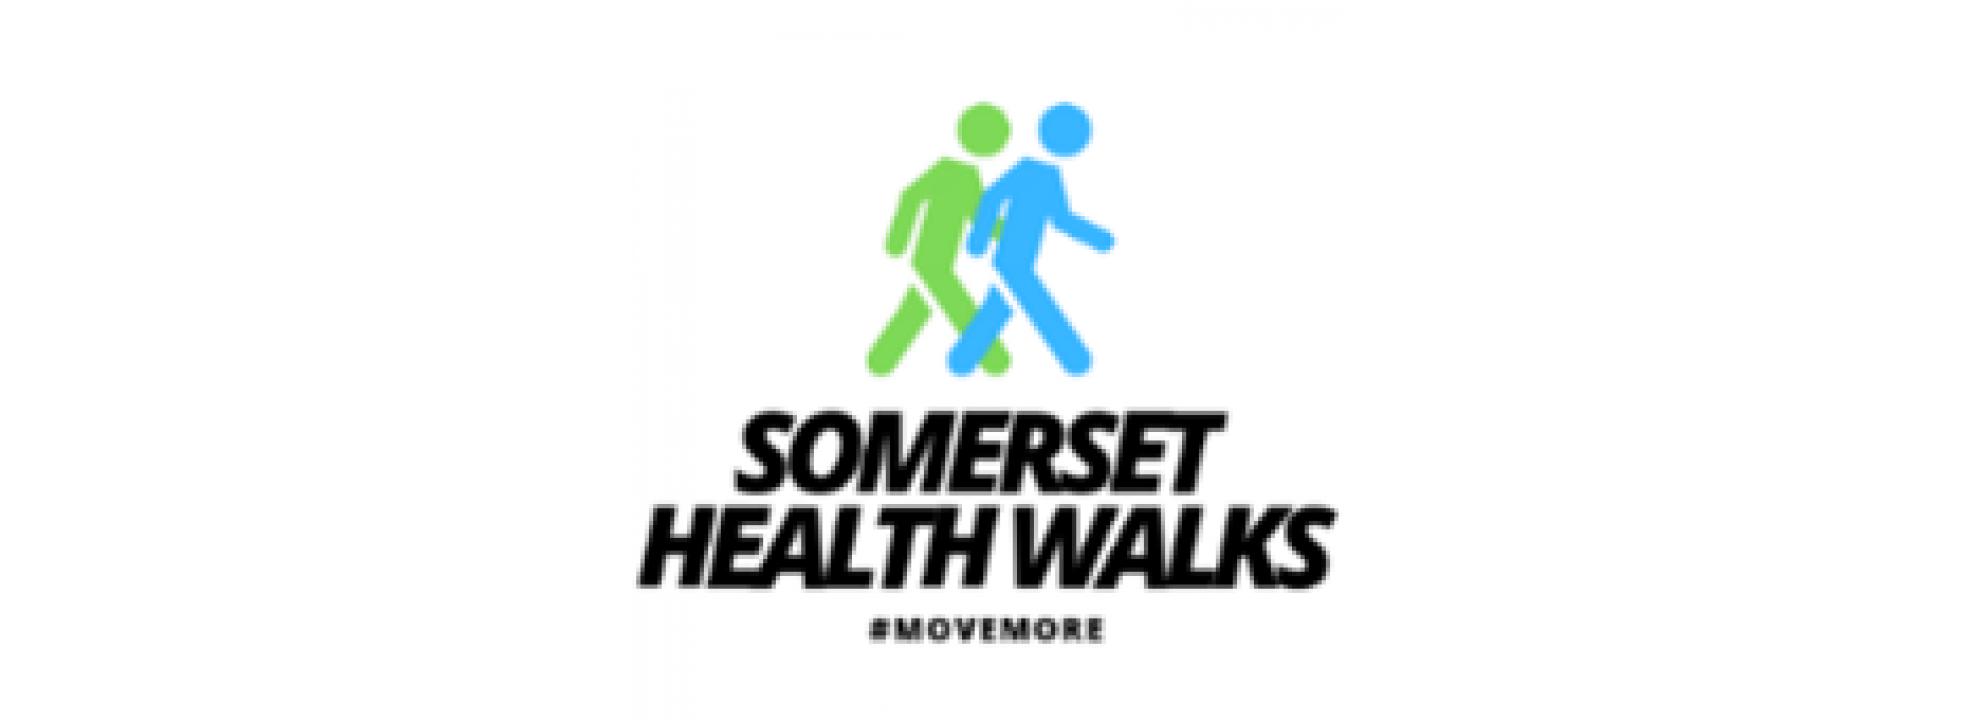 Free Minehead area weekly health walk Tuesdays Banner